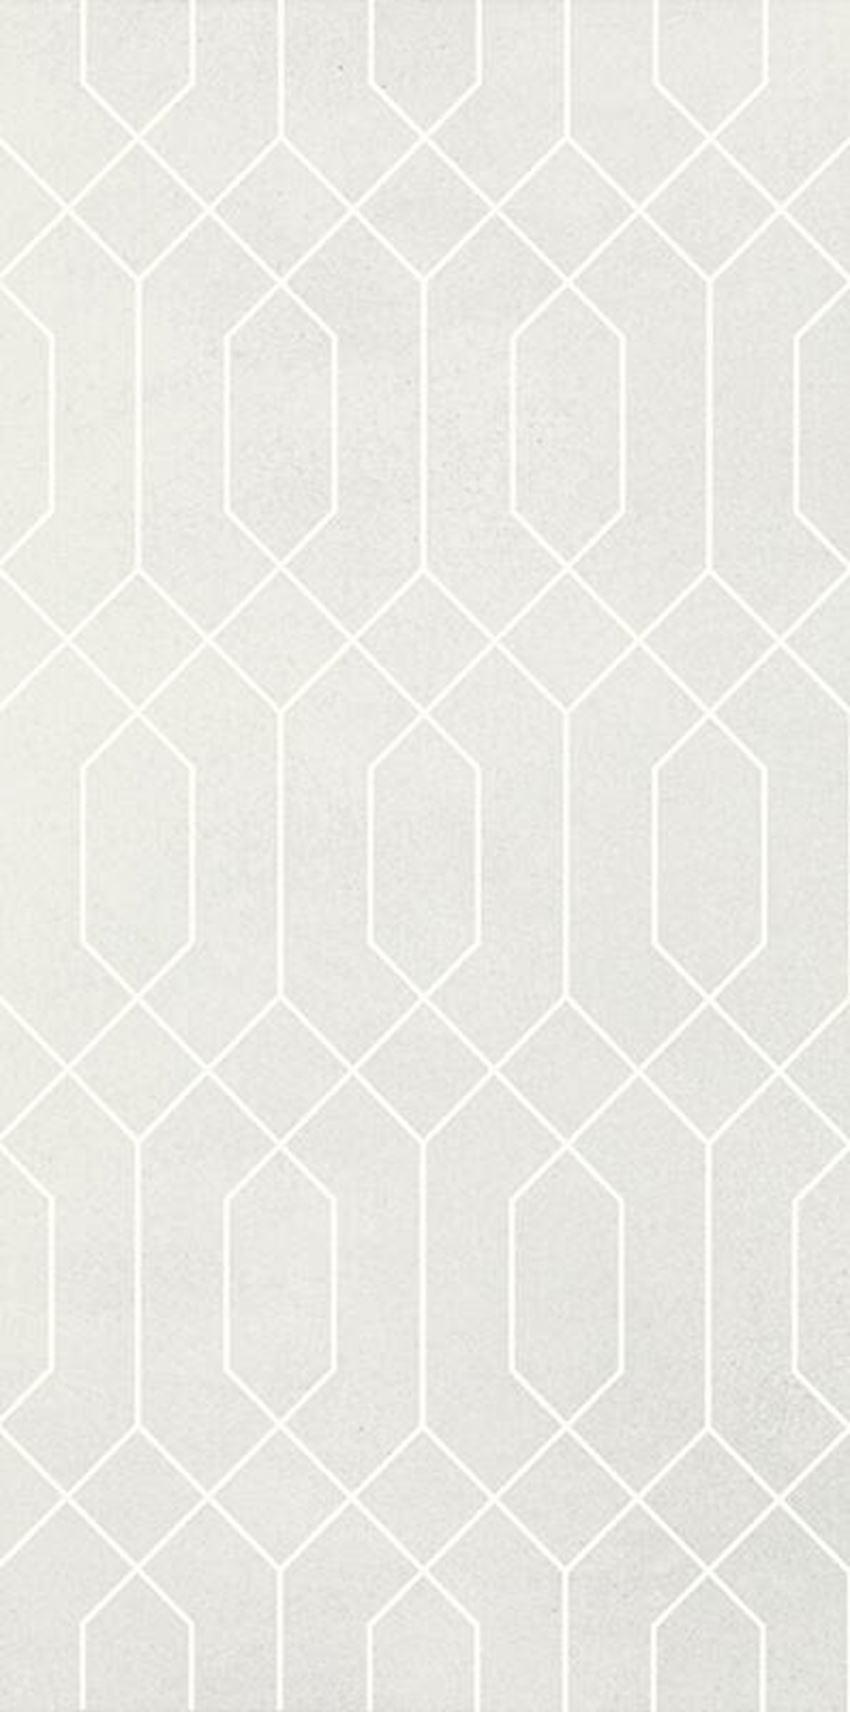 Płytka ścienna 29,5x59,5 cm Paradyż Taiga Silver Ściana Rekt. Dekor